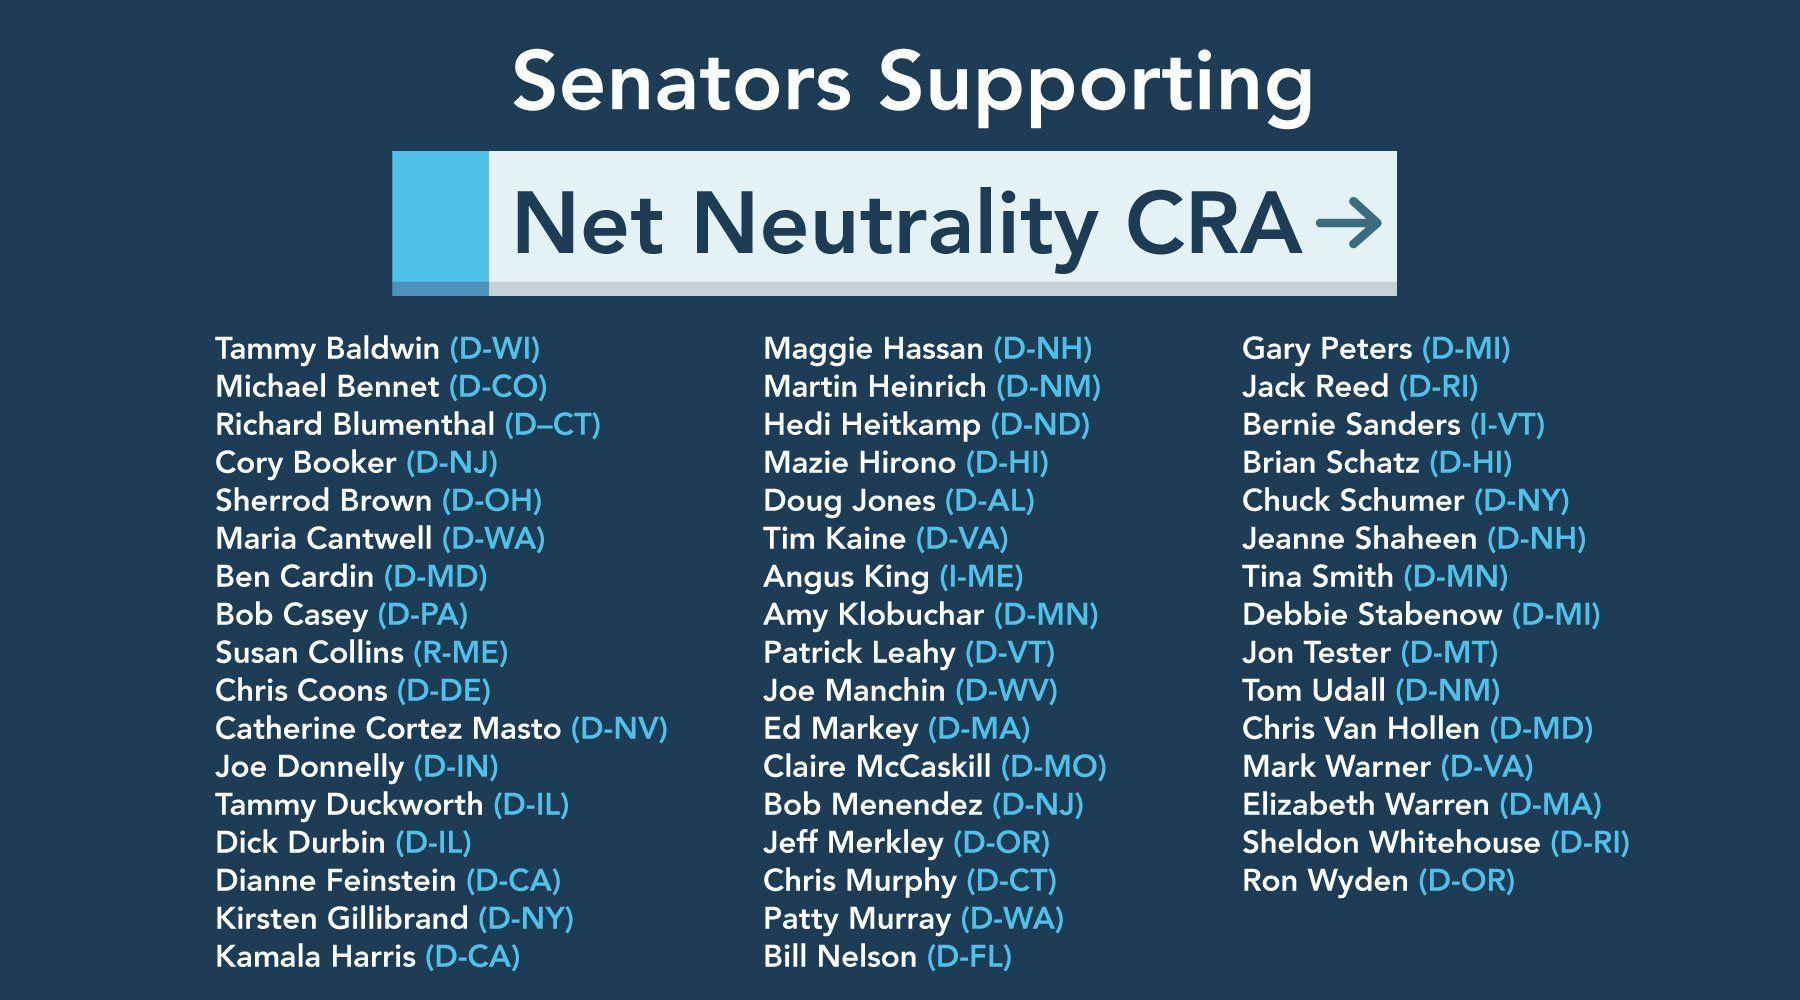 A List Of Senators Supporting Net Neutrality Net Neutrality